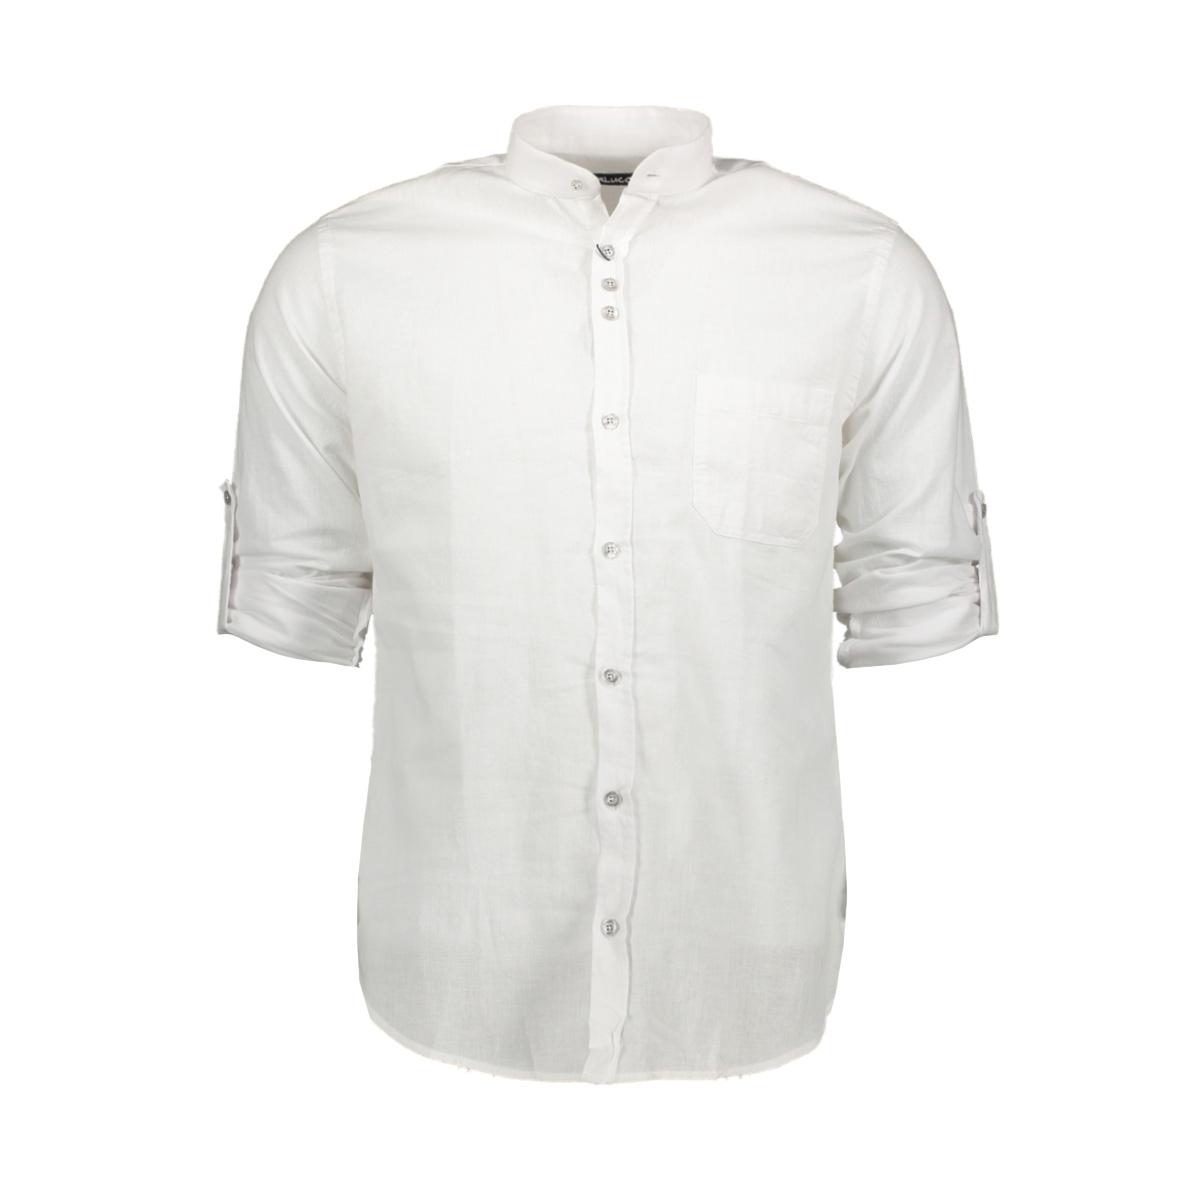 Overhemd Wit.Ferlucci Lucca Linnen Hemd Ferlucci Overhemd Wit